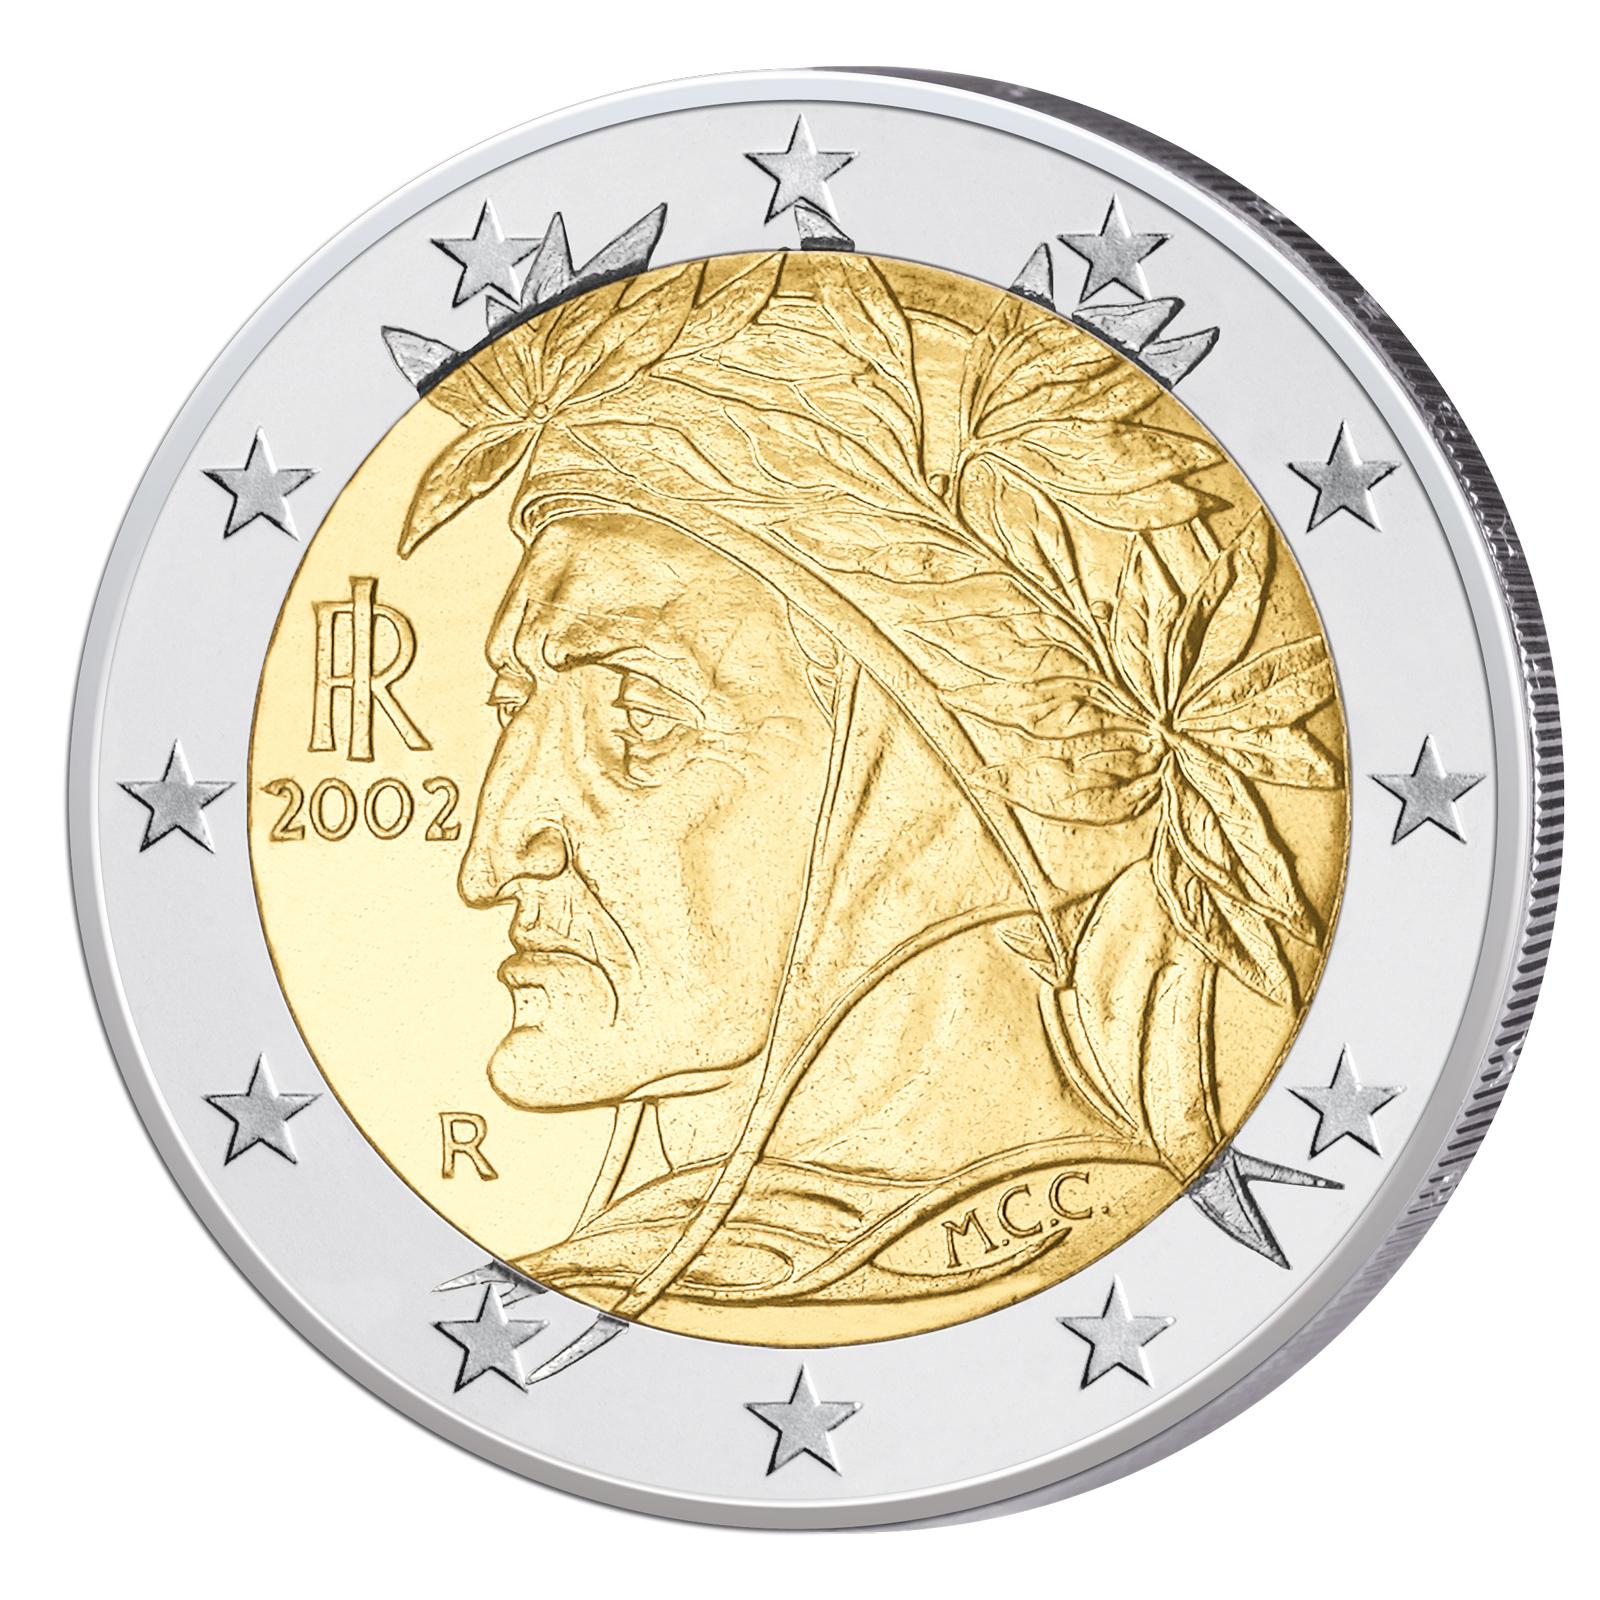 14 September 1321 Dante Verstirbt Primus Münzen Blog